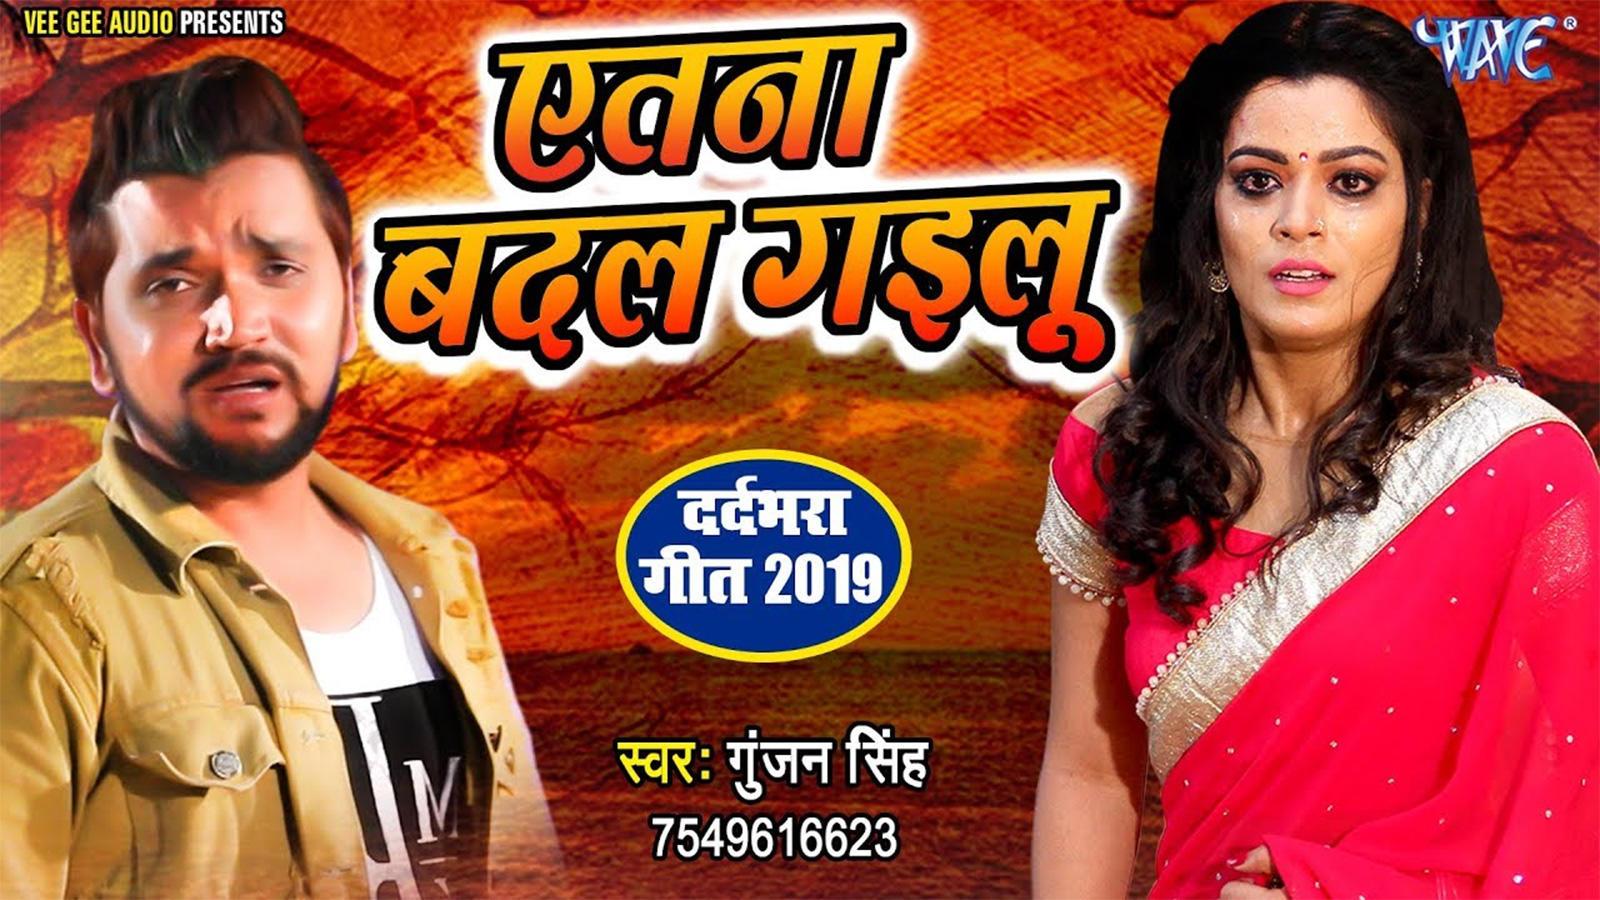 Latest Bhojpuri Song 'Itna Badal Gailu' (Audio) Sung By Gunjan Singh |  Bhojpuri Video Songs - Times of India